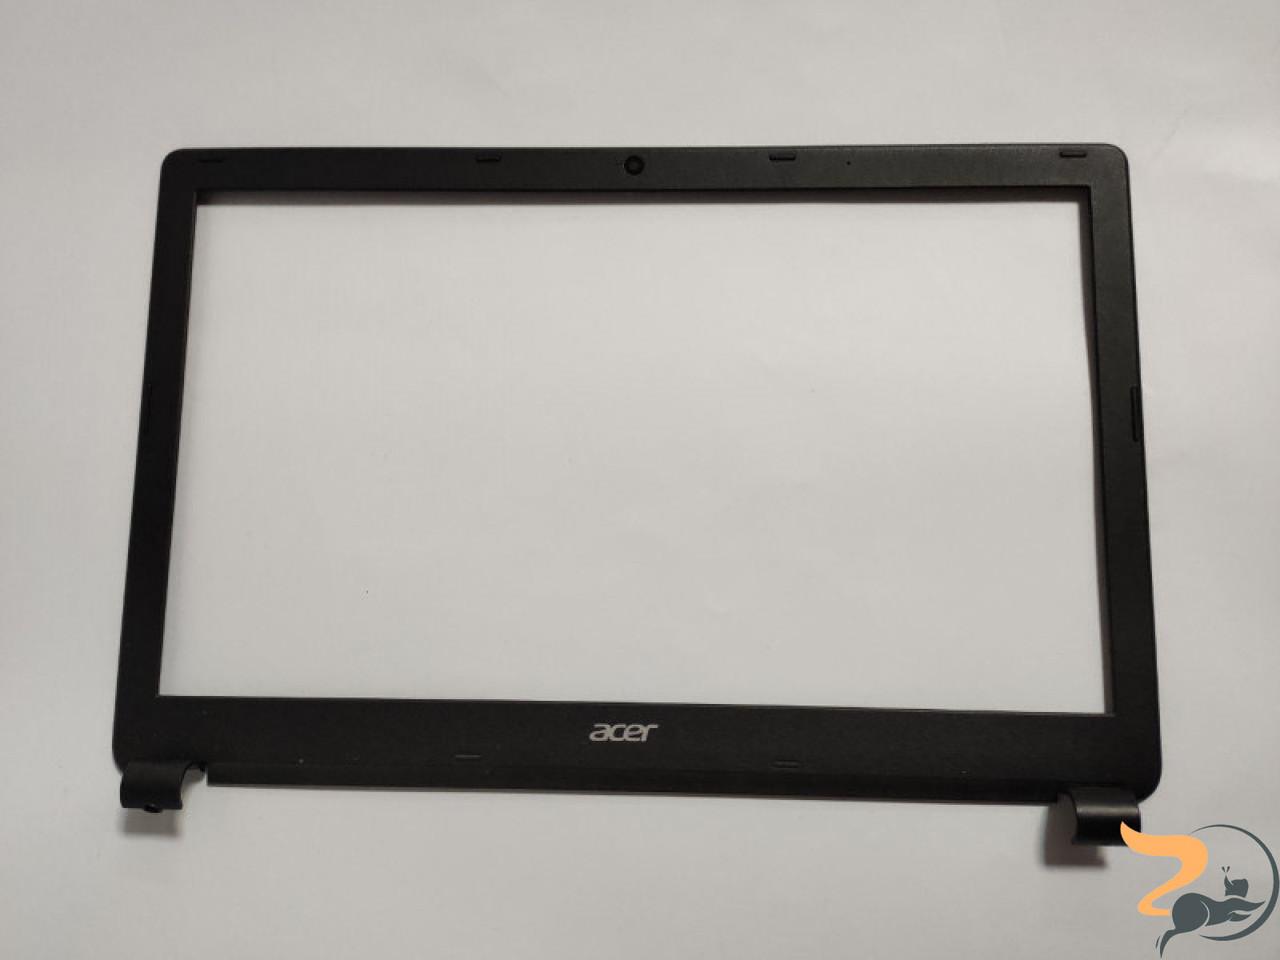 "Рамка матриці для ноутбука Acer Aspire E1-522, MS2372, 15.6"", 604YU01011, 41.4y01.001, б/в. В хорошому стані, без пошкодженнь."